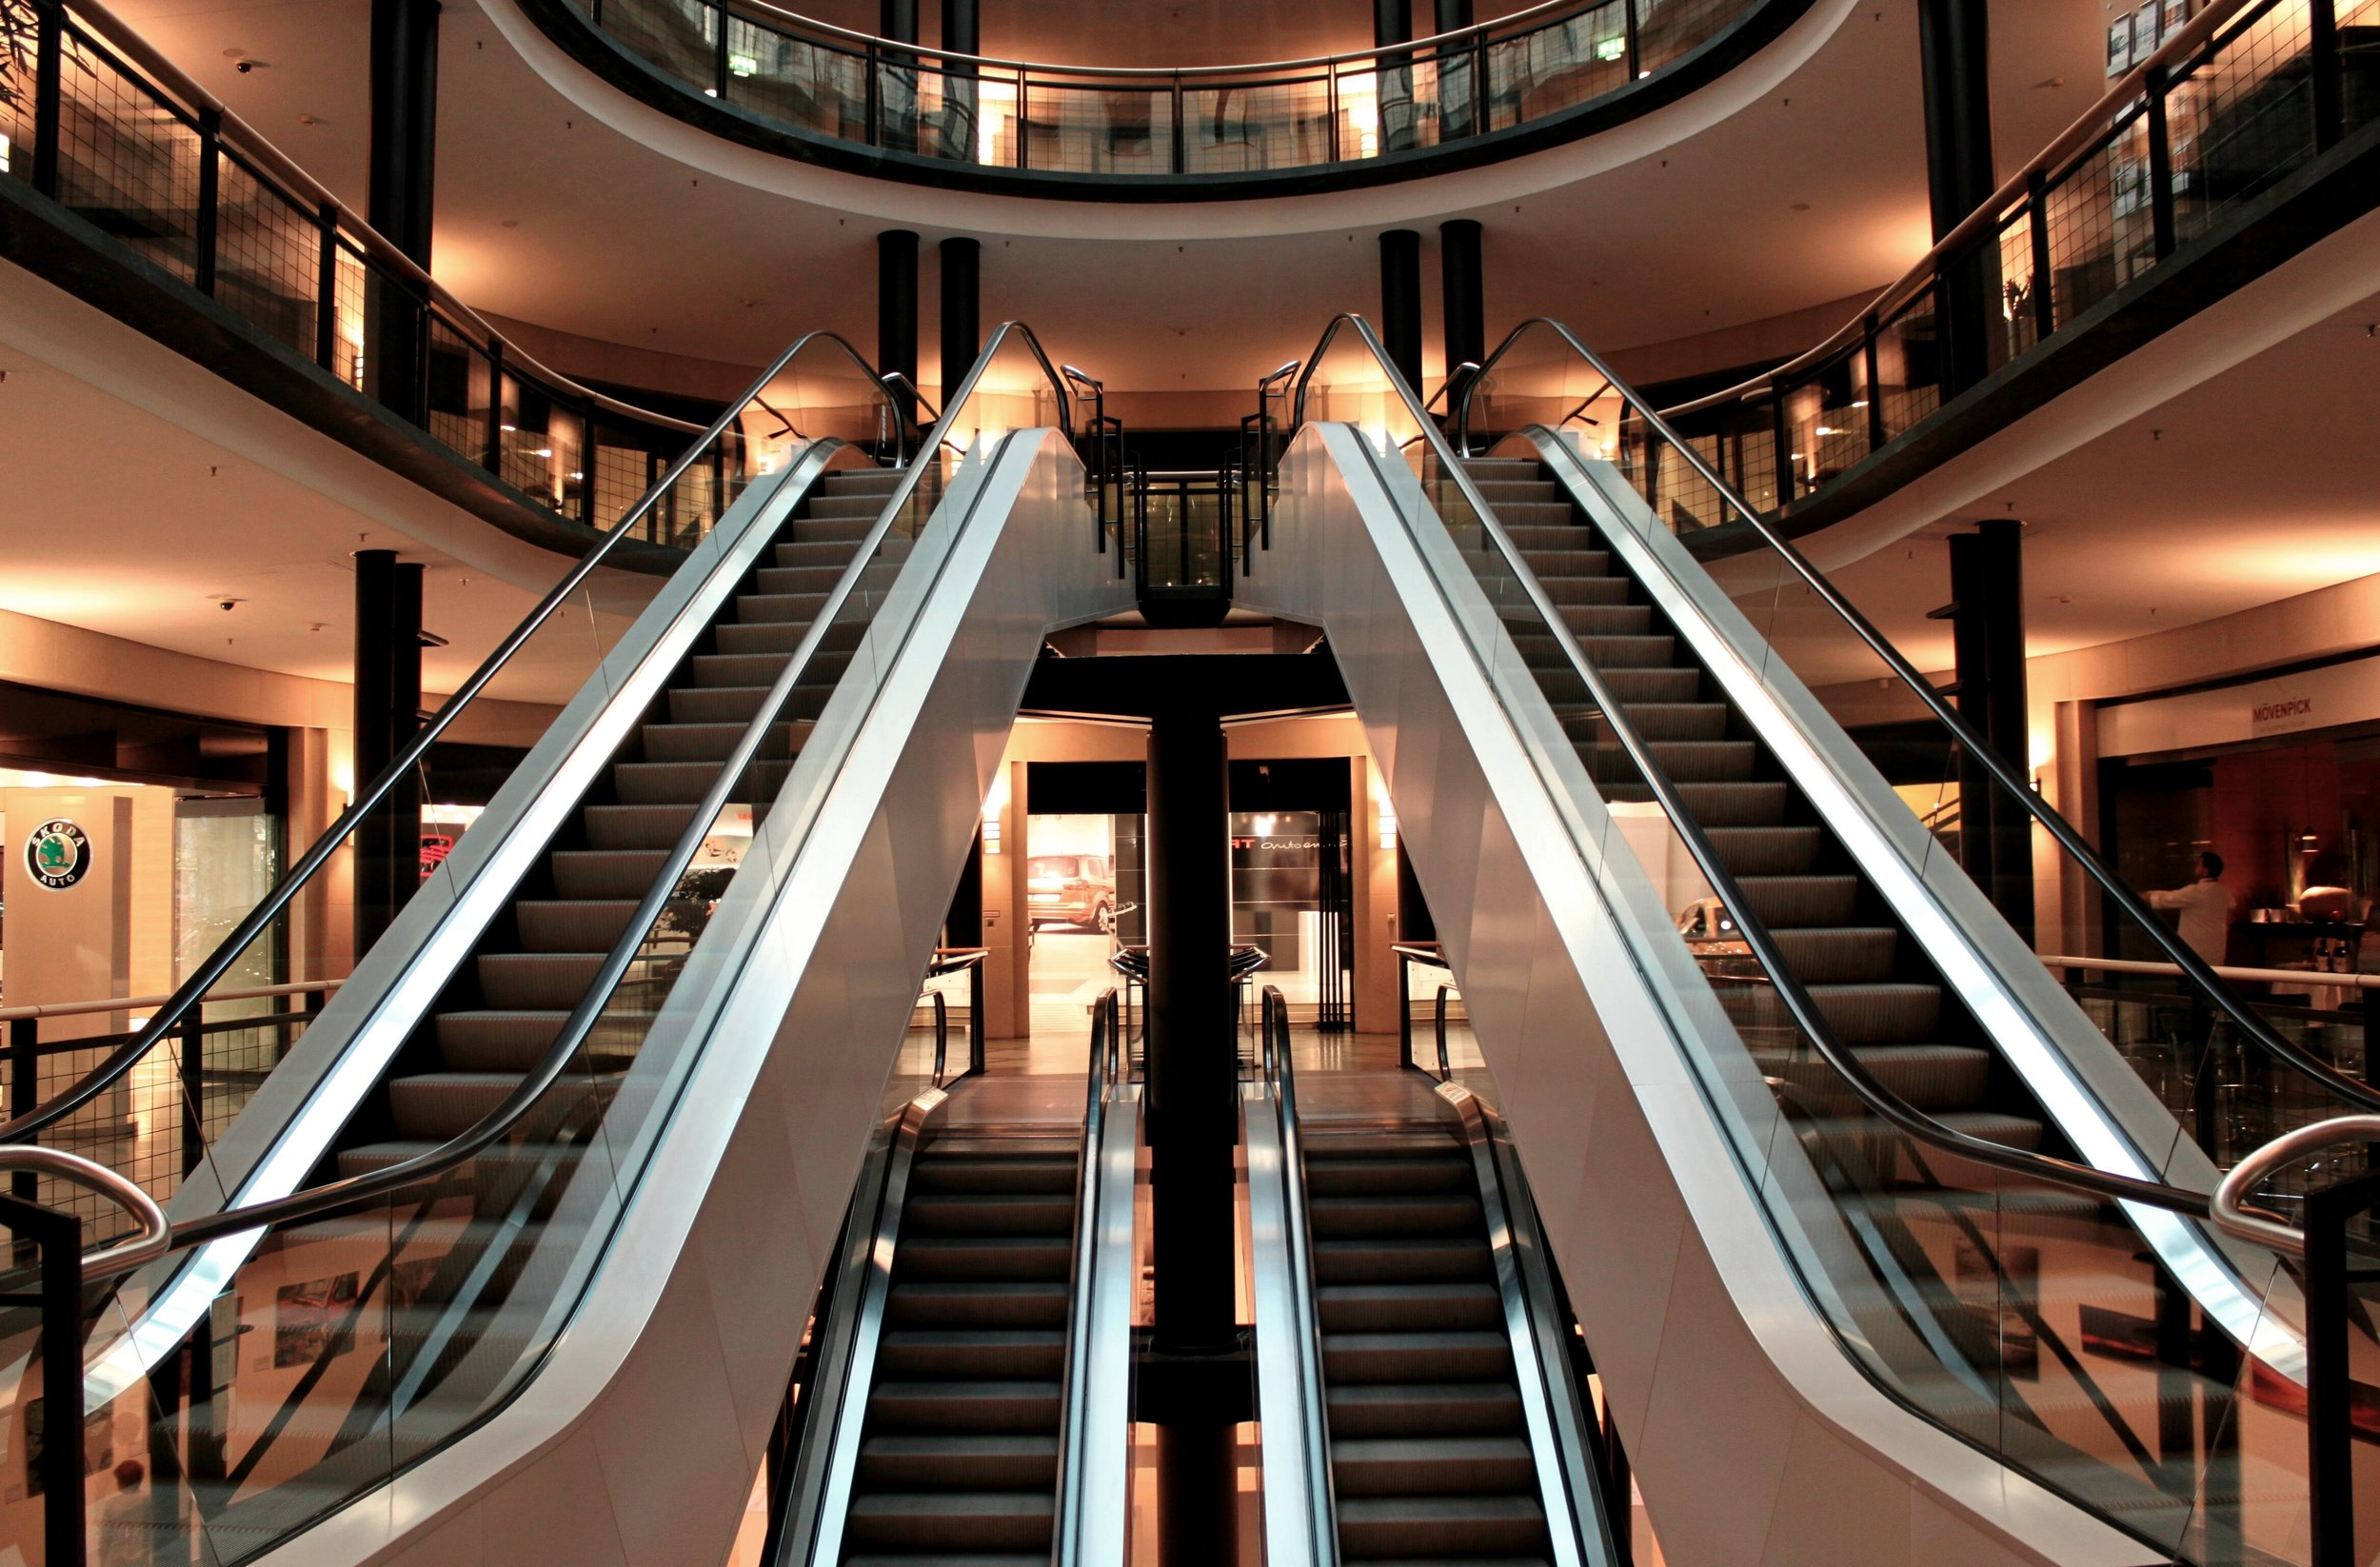 escalators.jpeg